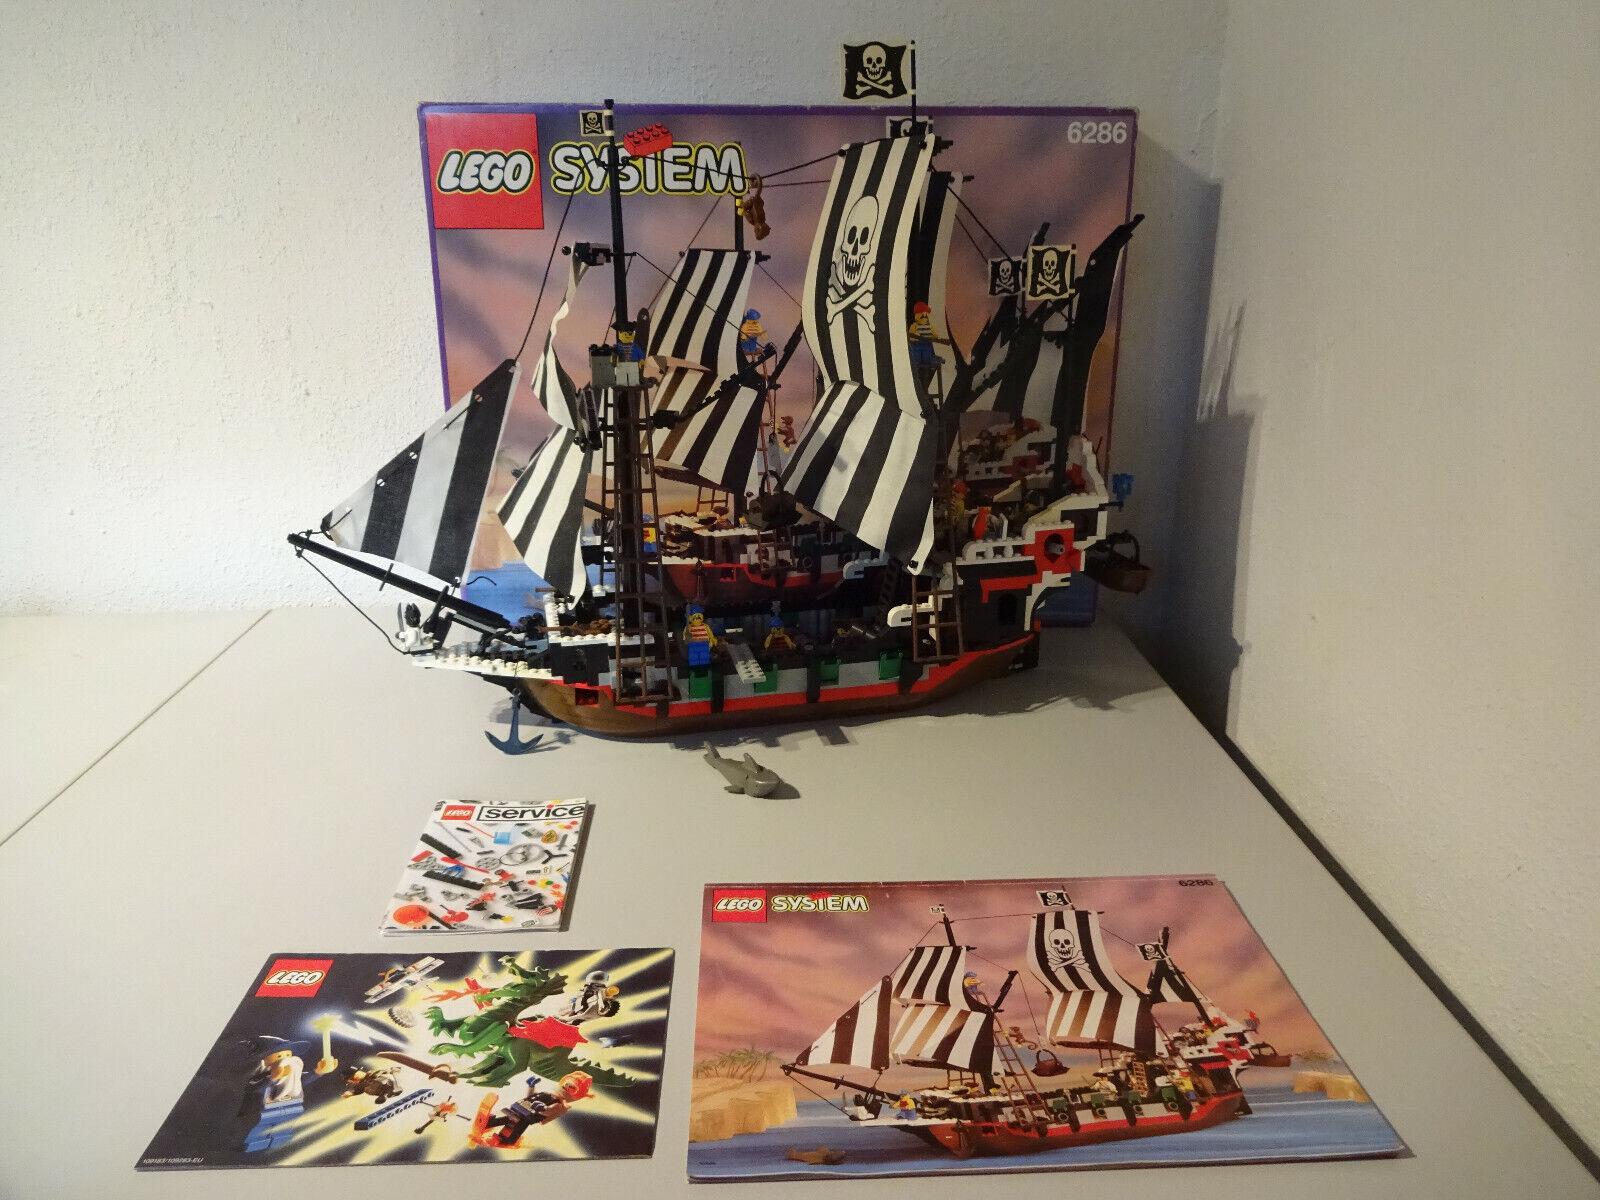 (TB) LEGO SYSTEM 6286 SKULL'S EYE SCHOONER MIT OVP & BA 100% KOMPLETT MIT ILAY